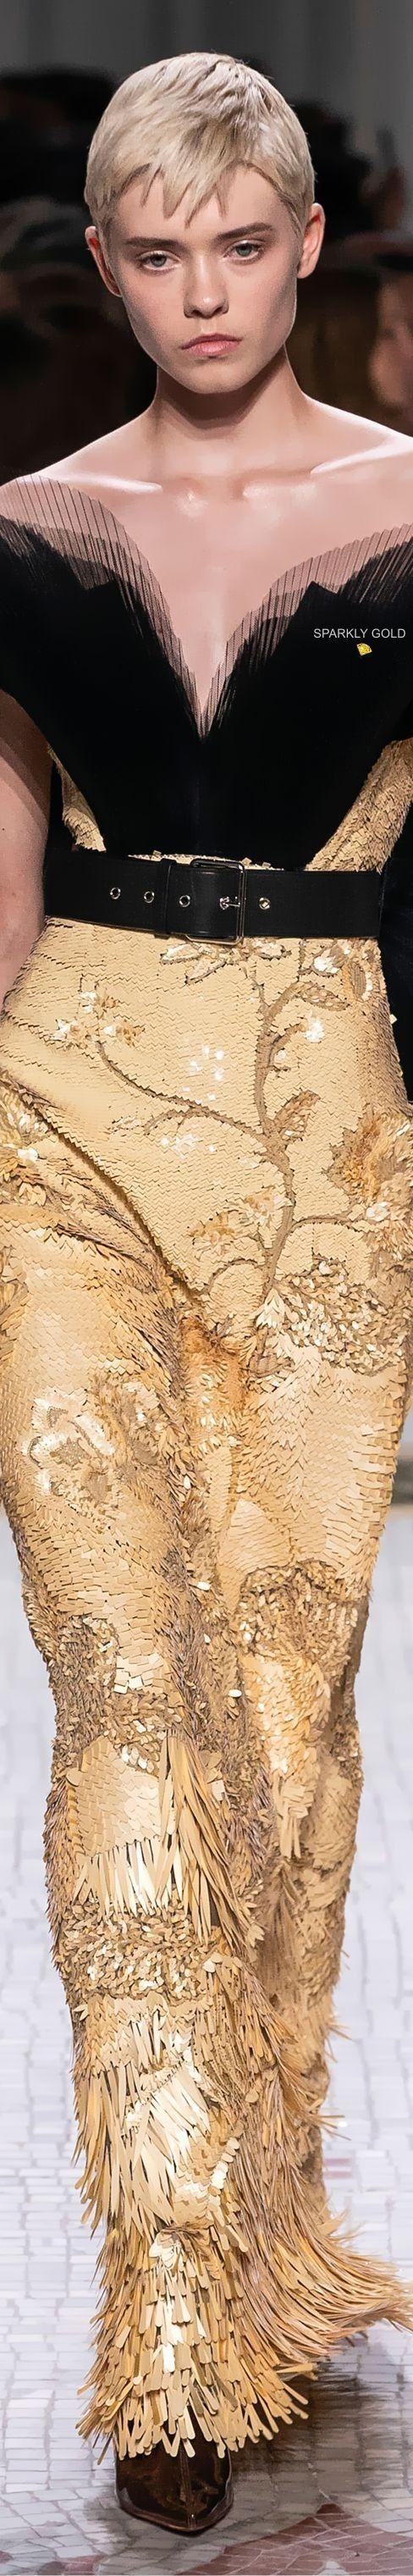 foto de Givenchy fall 2019 couture Saison 2